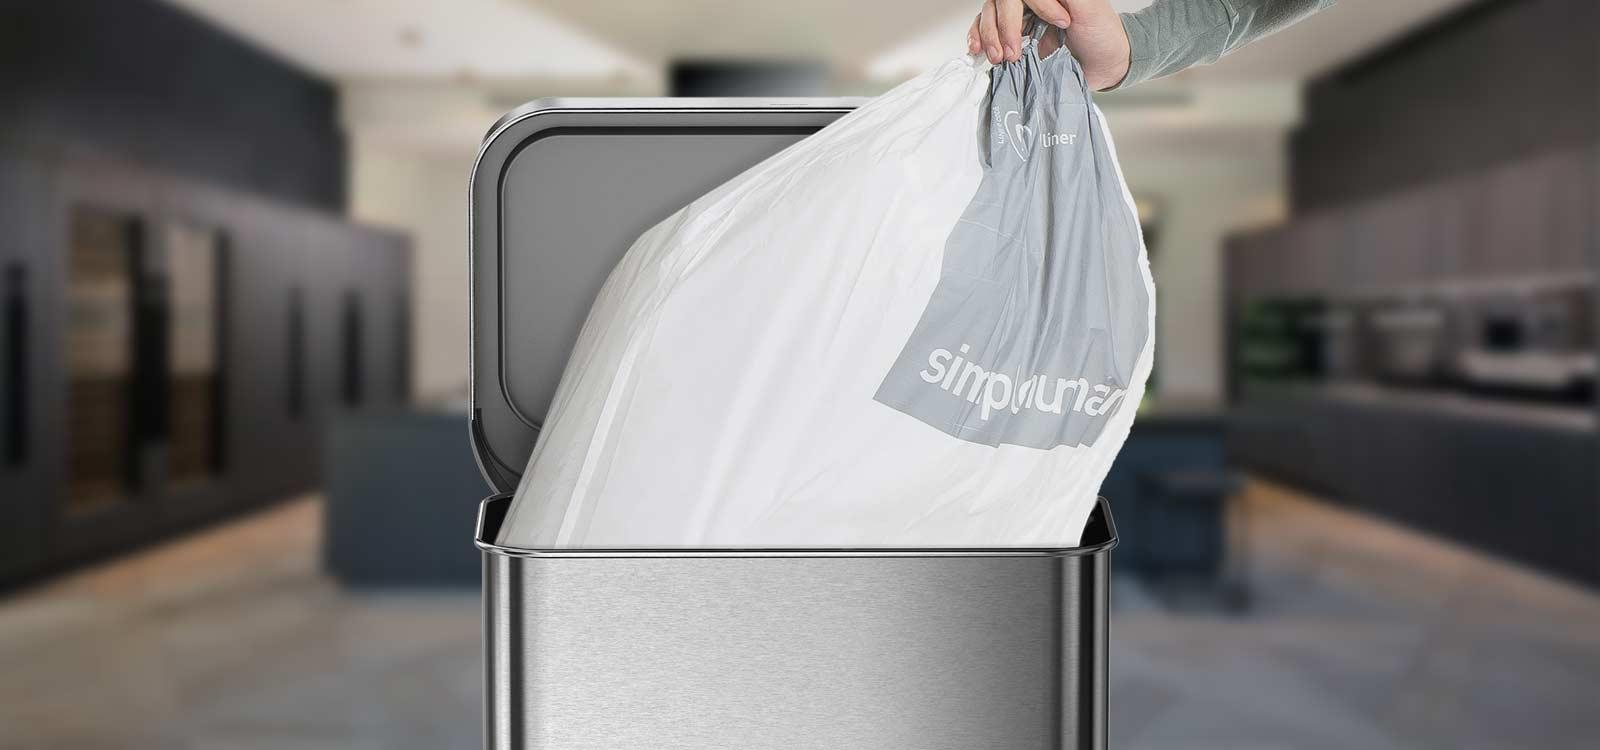 vuilniszak-afvalzak-prullenbak-afval-scheiden